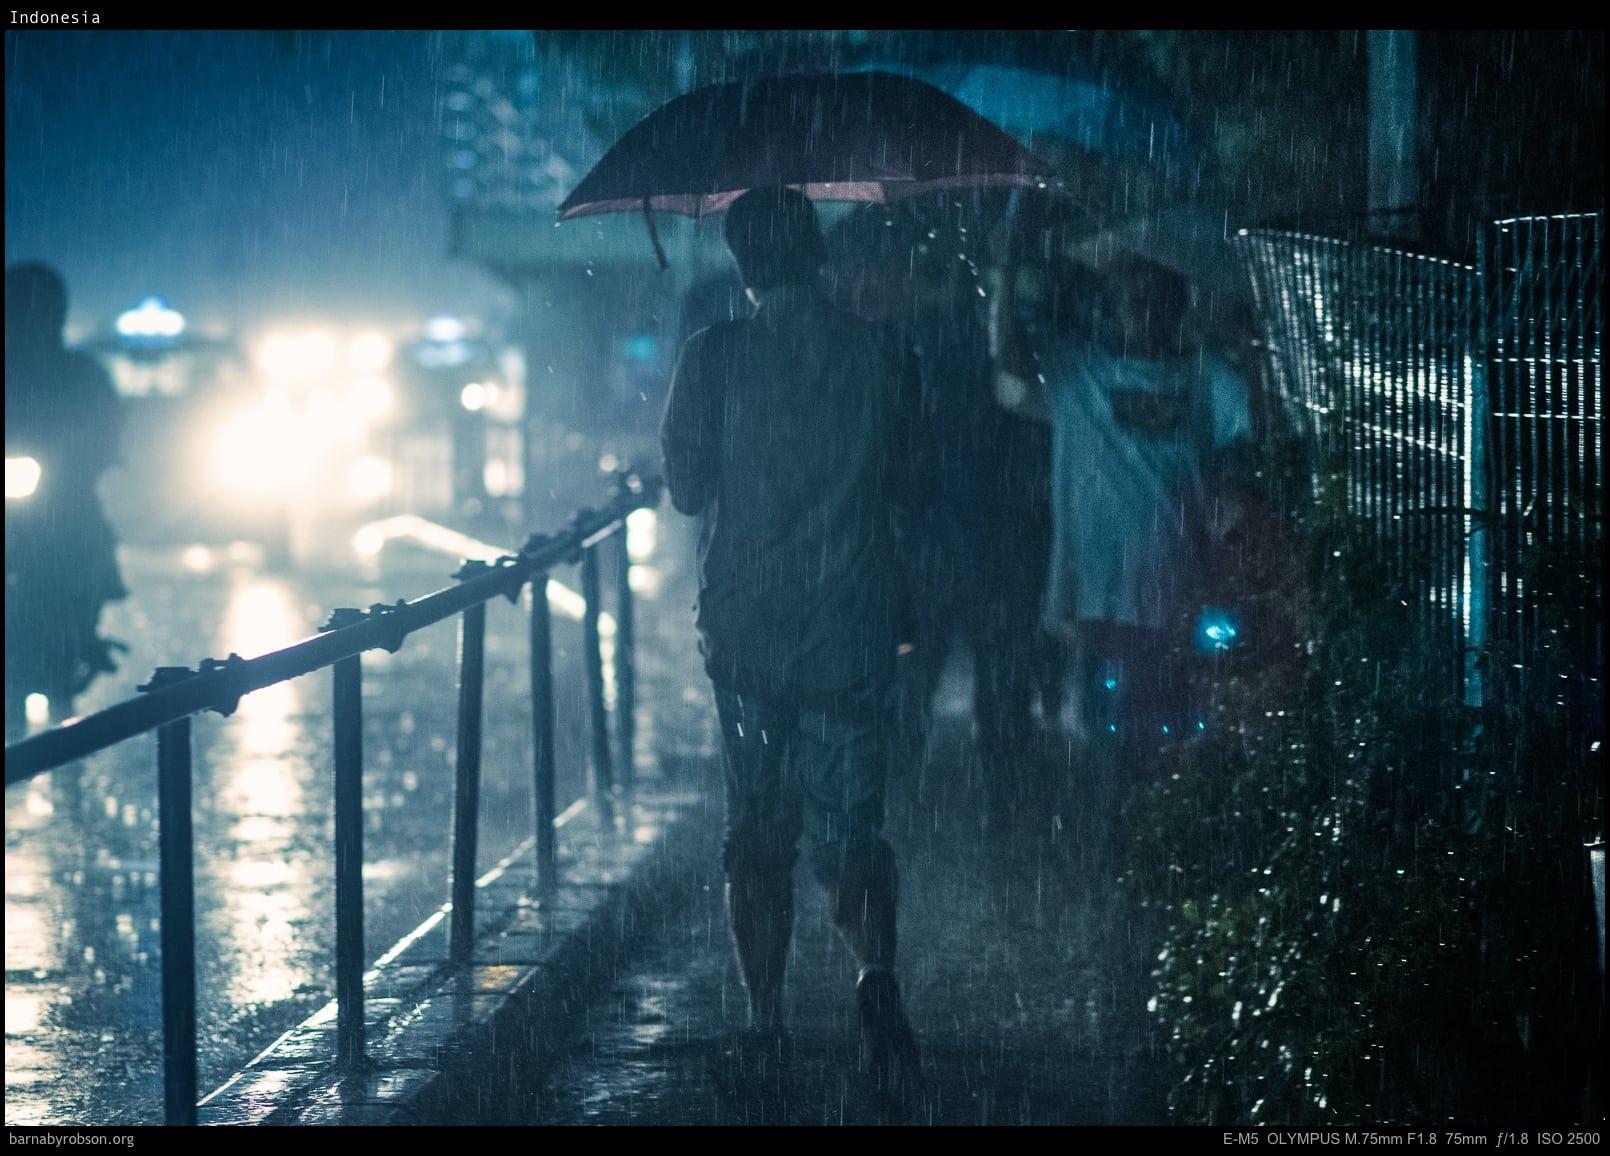 night rain in the city